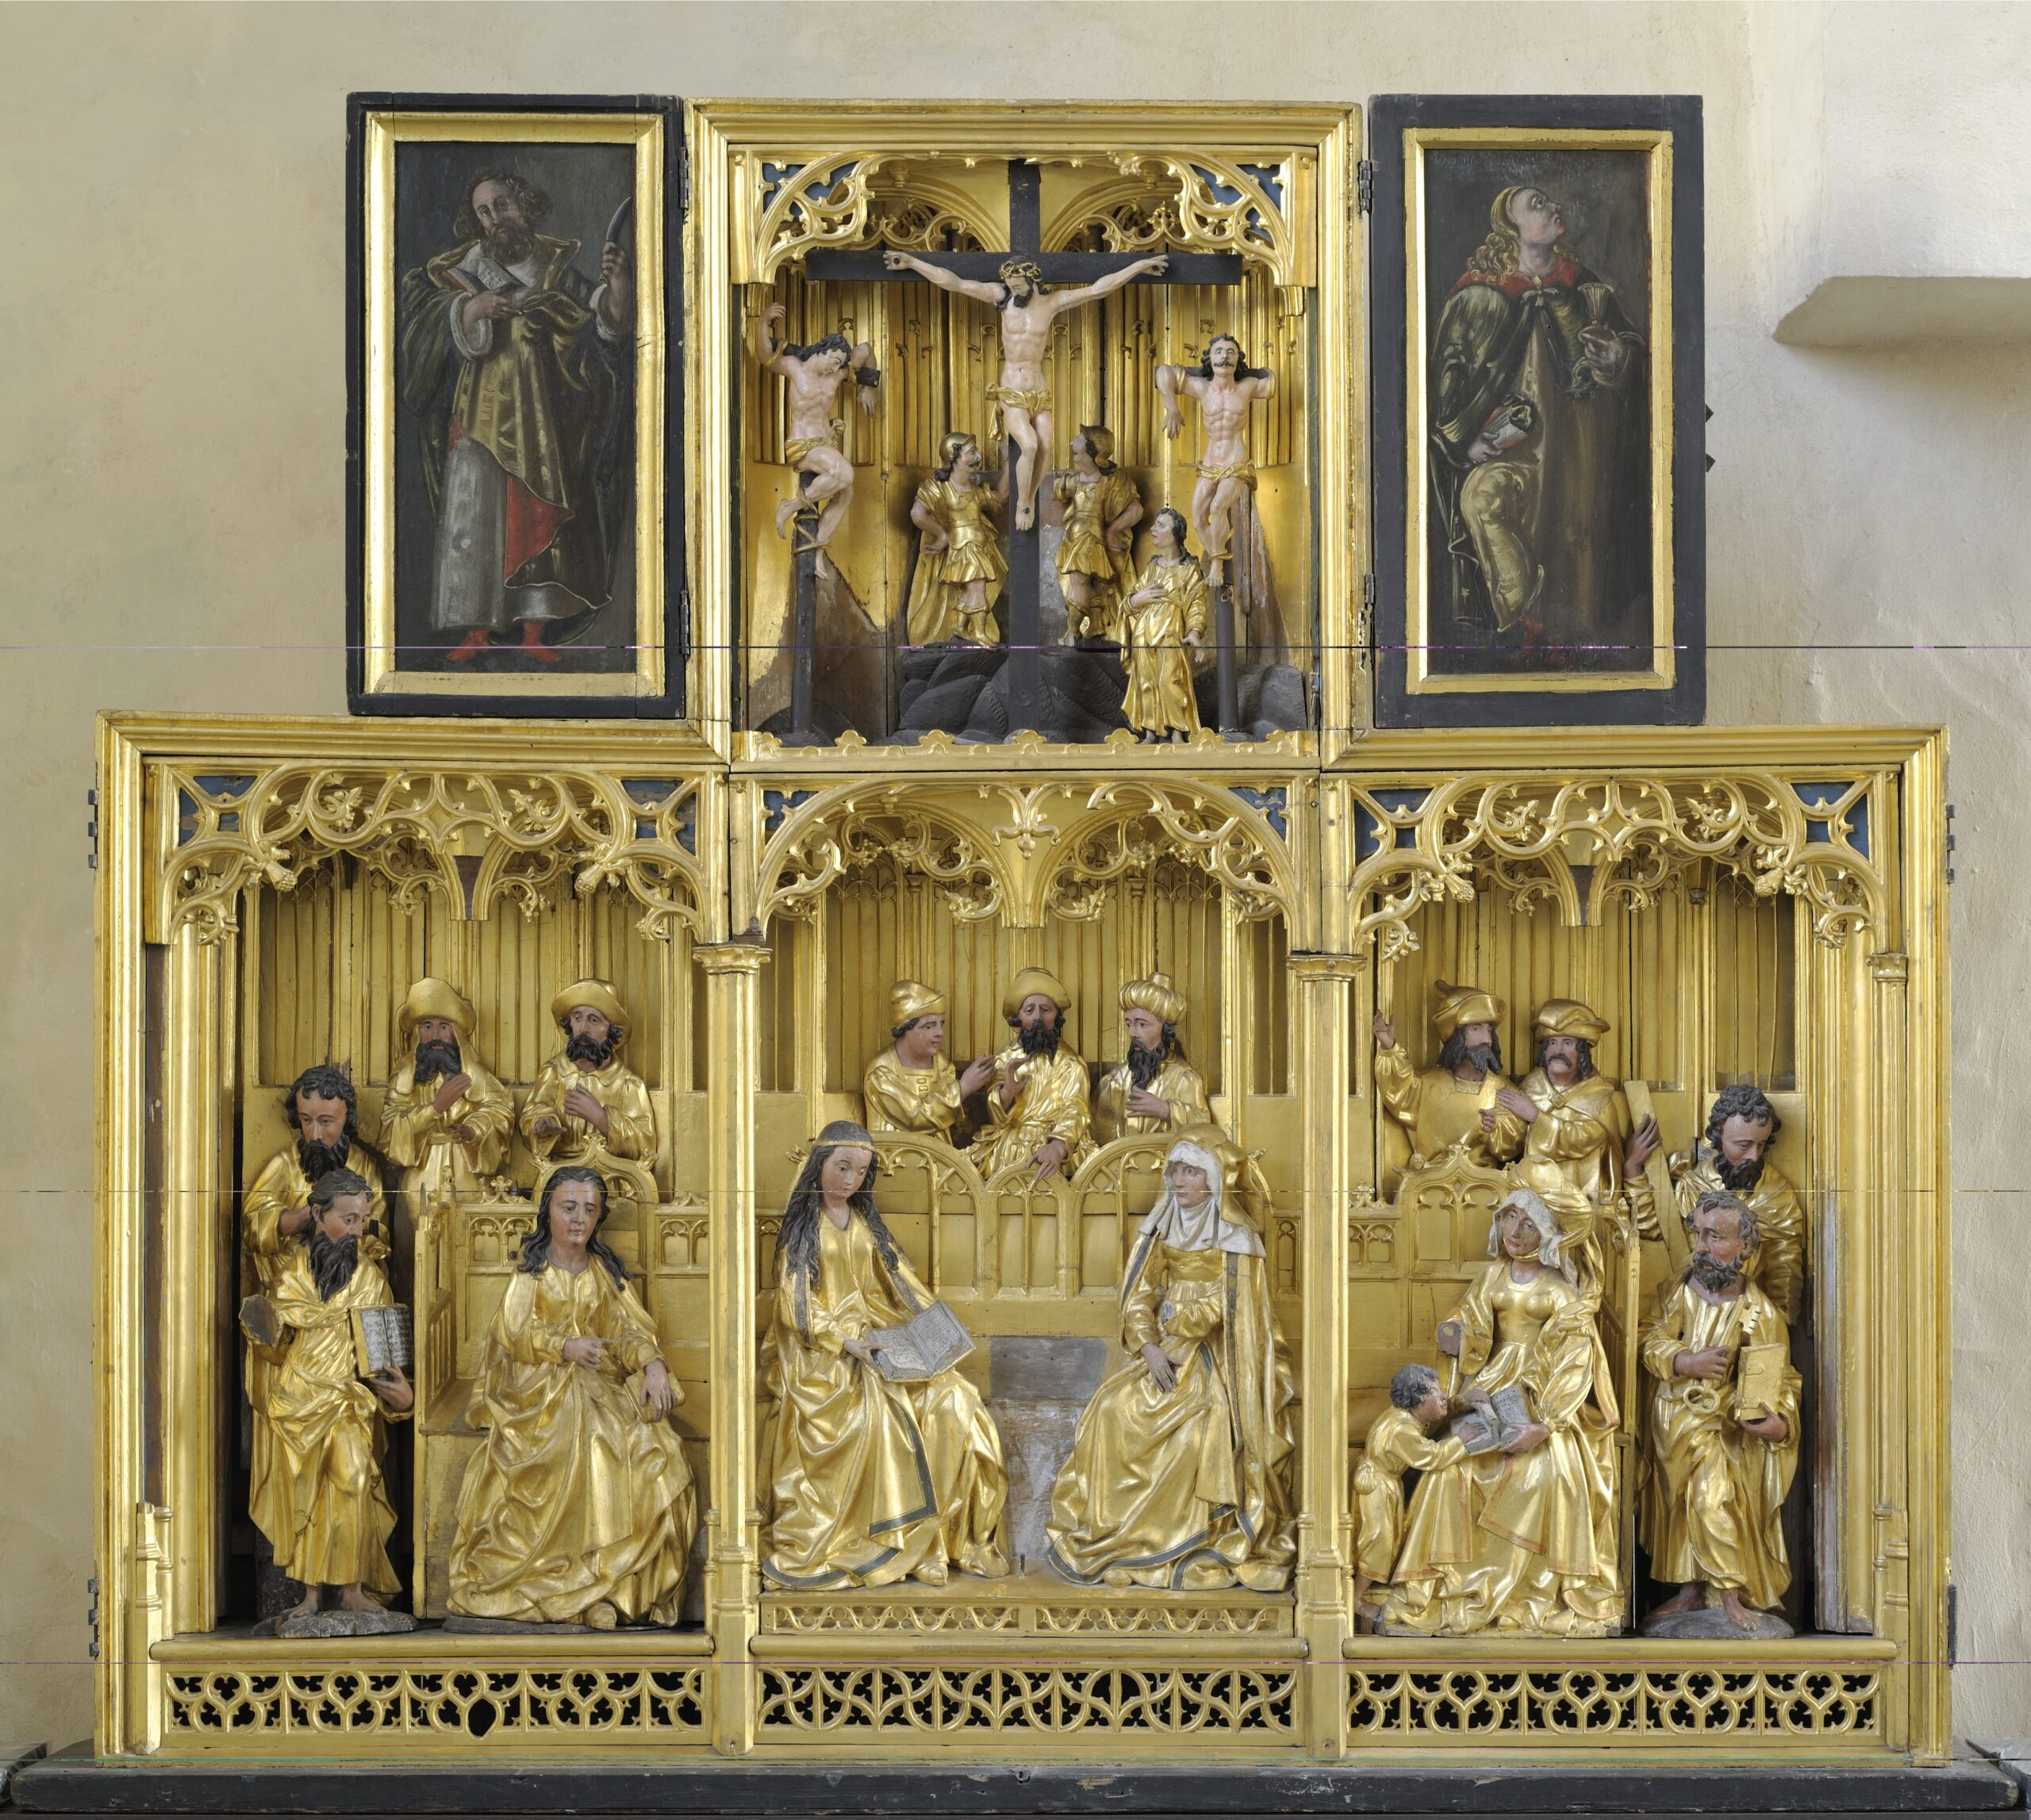 Brussels workshop, The Holy Kinship Altarpiece, ca. 1500Art Museum of Estonia